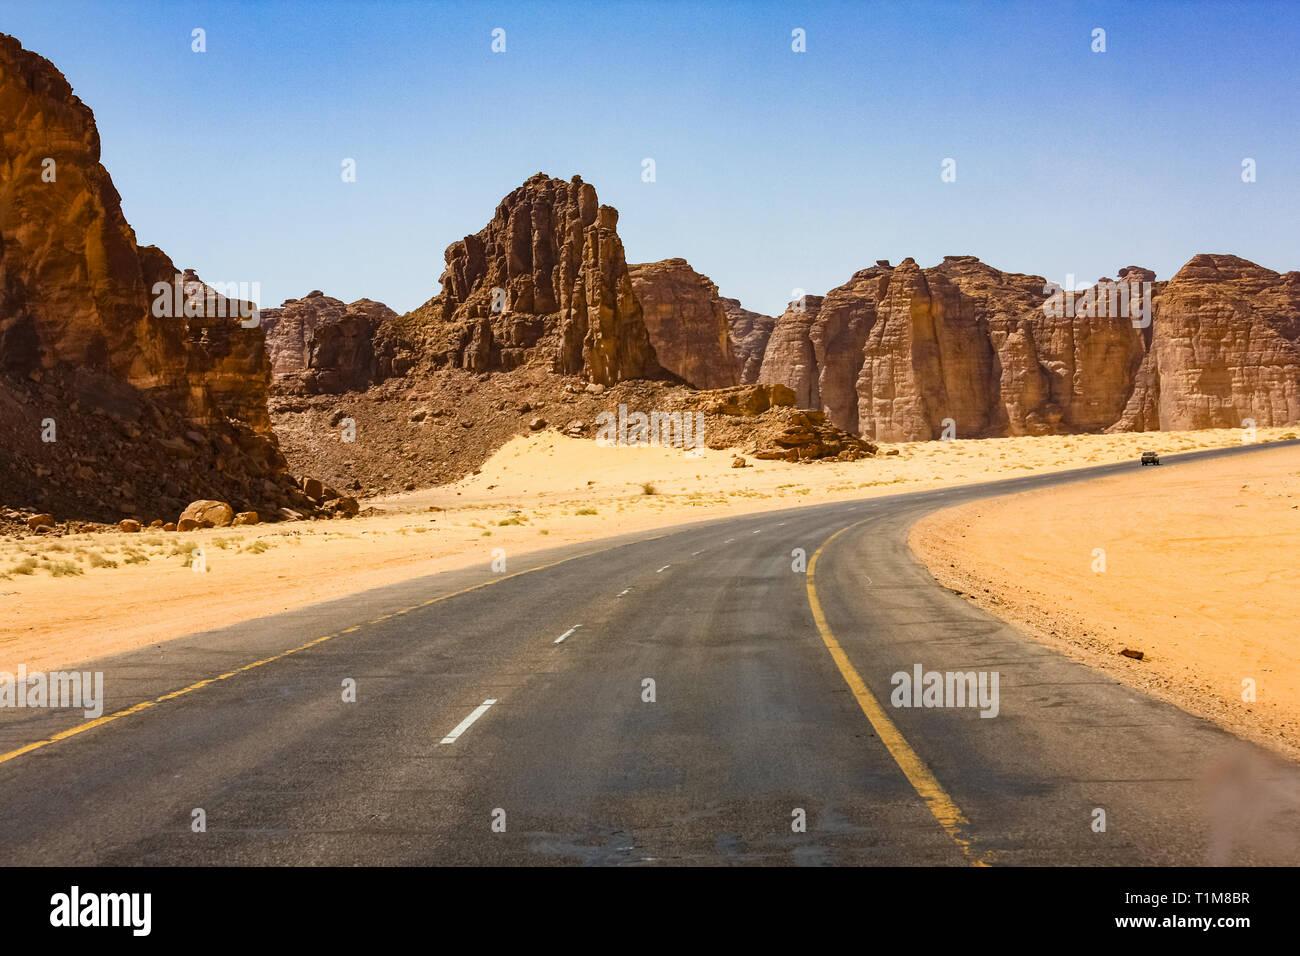 Road leading to Al Ula, Saudi Arabia - Stock Image